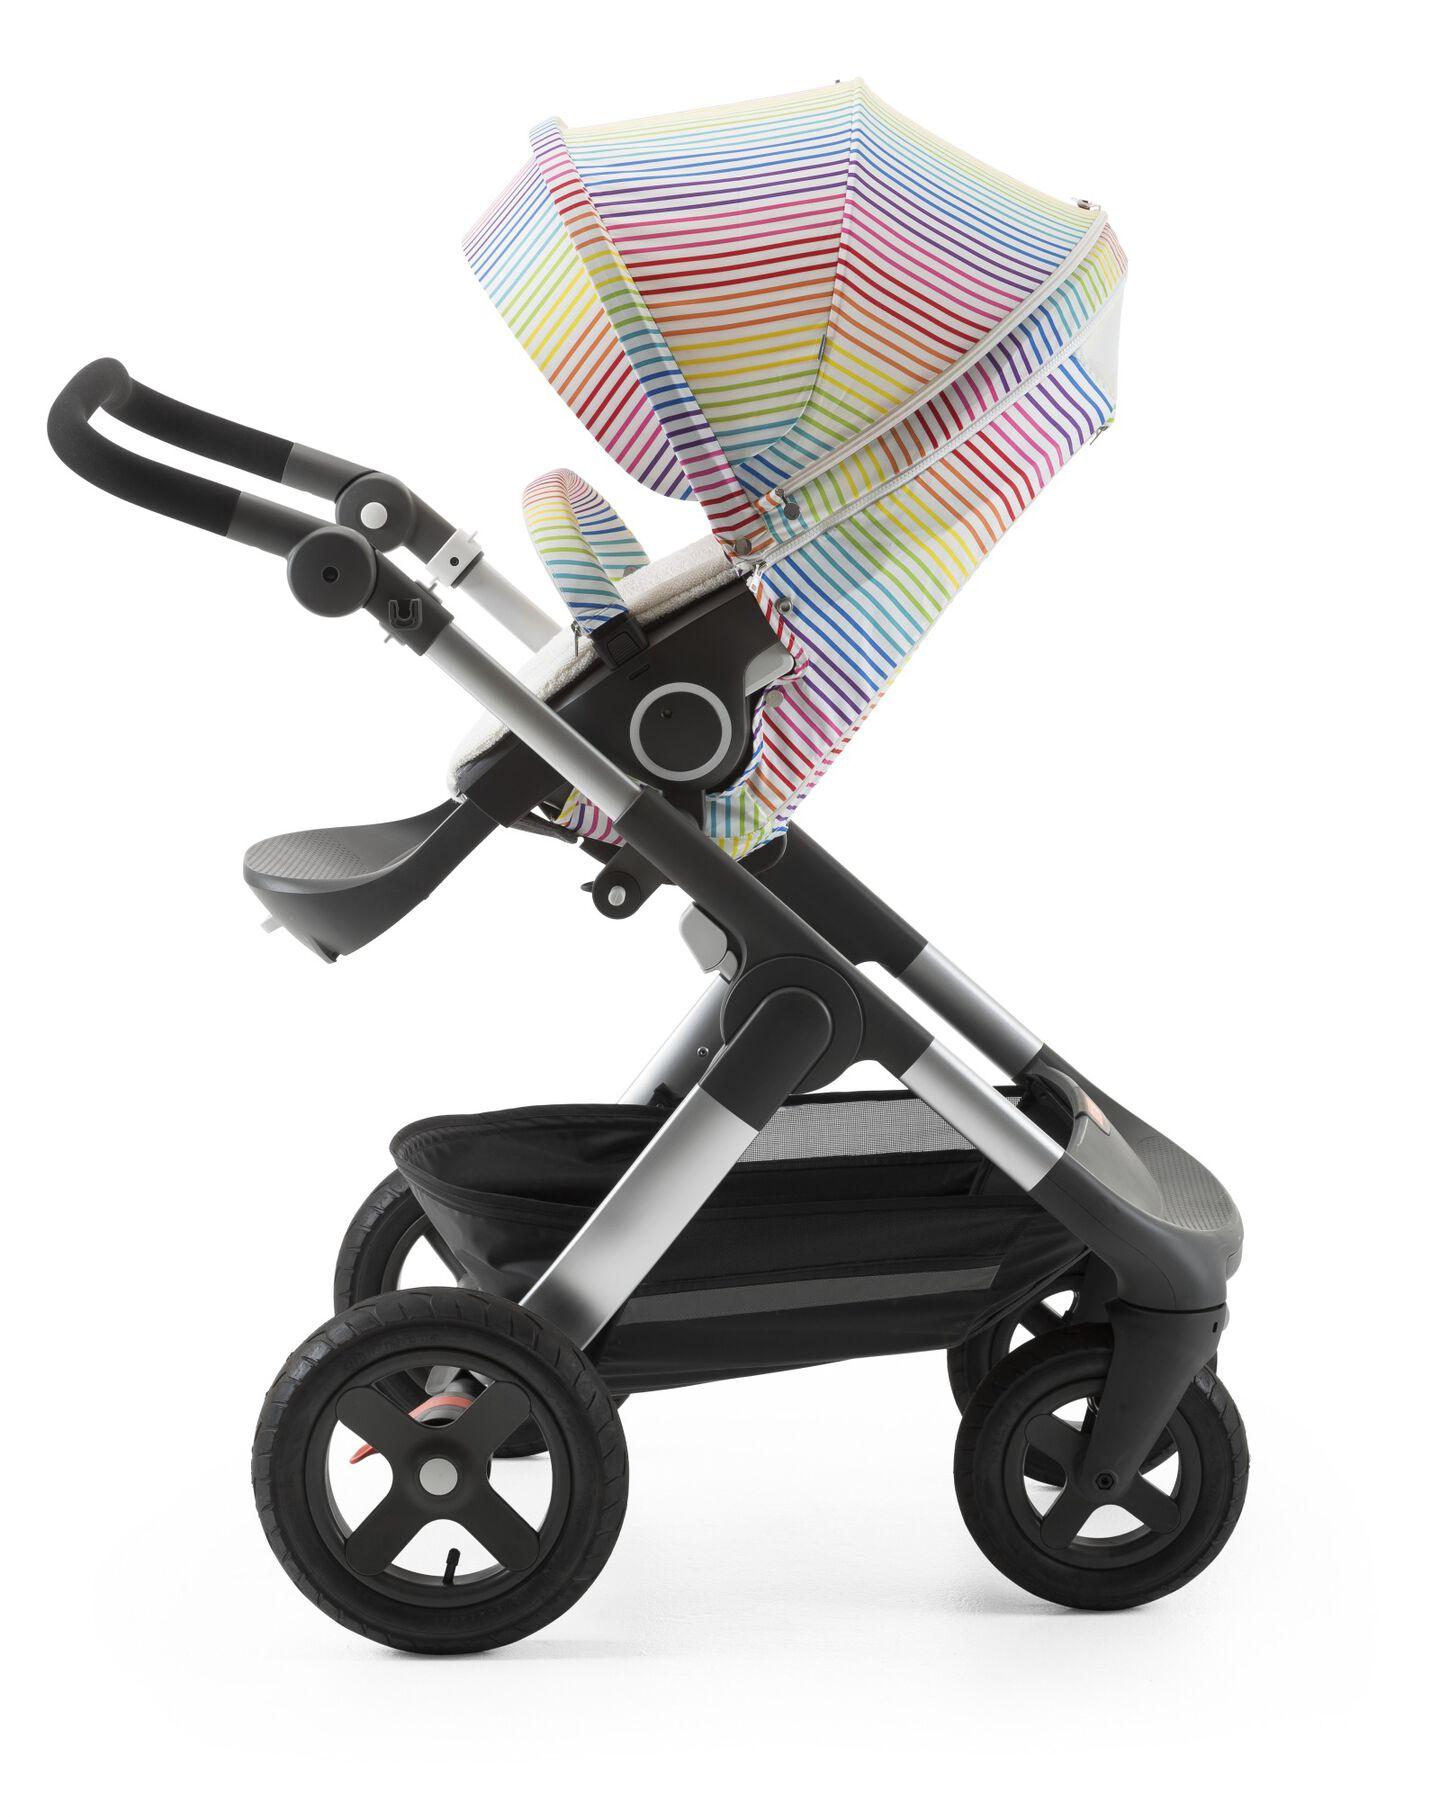 Stokke® Trailz™ with Stokke® Stroller Seat and Multi Stripe Summer Kit